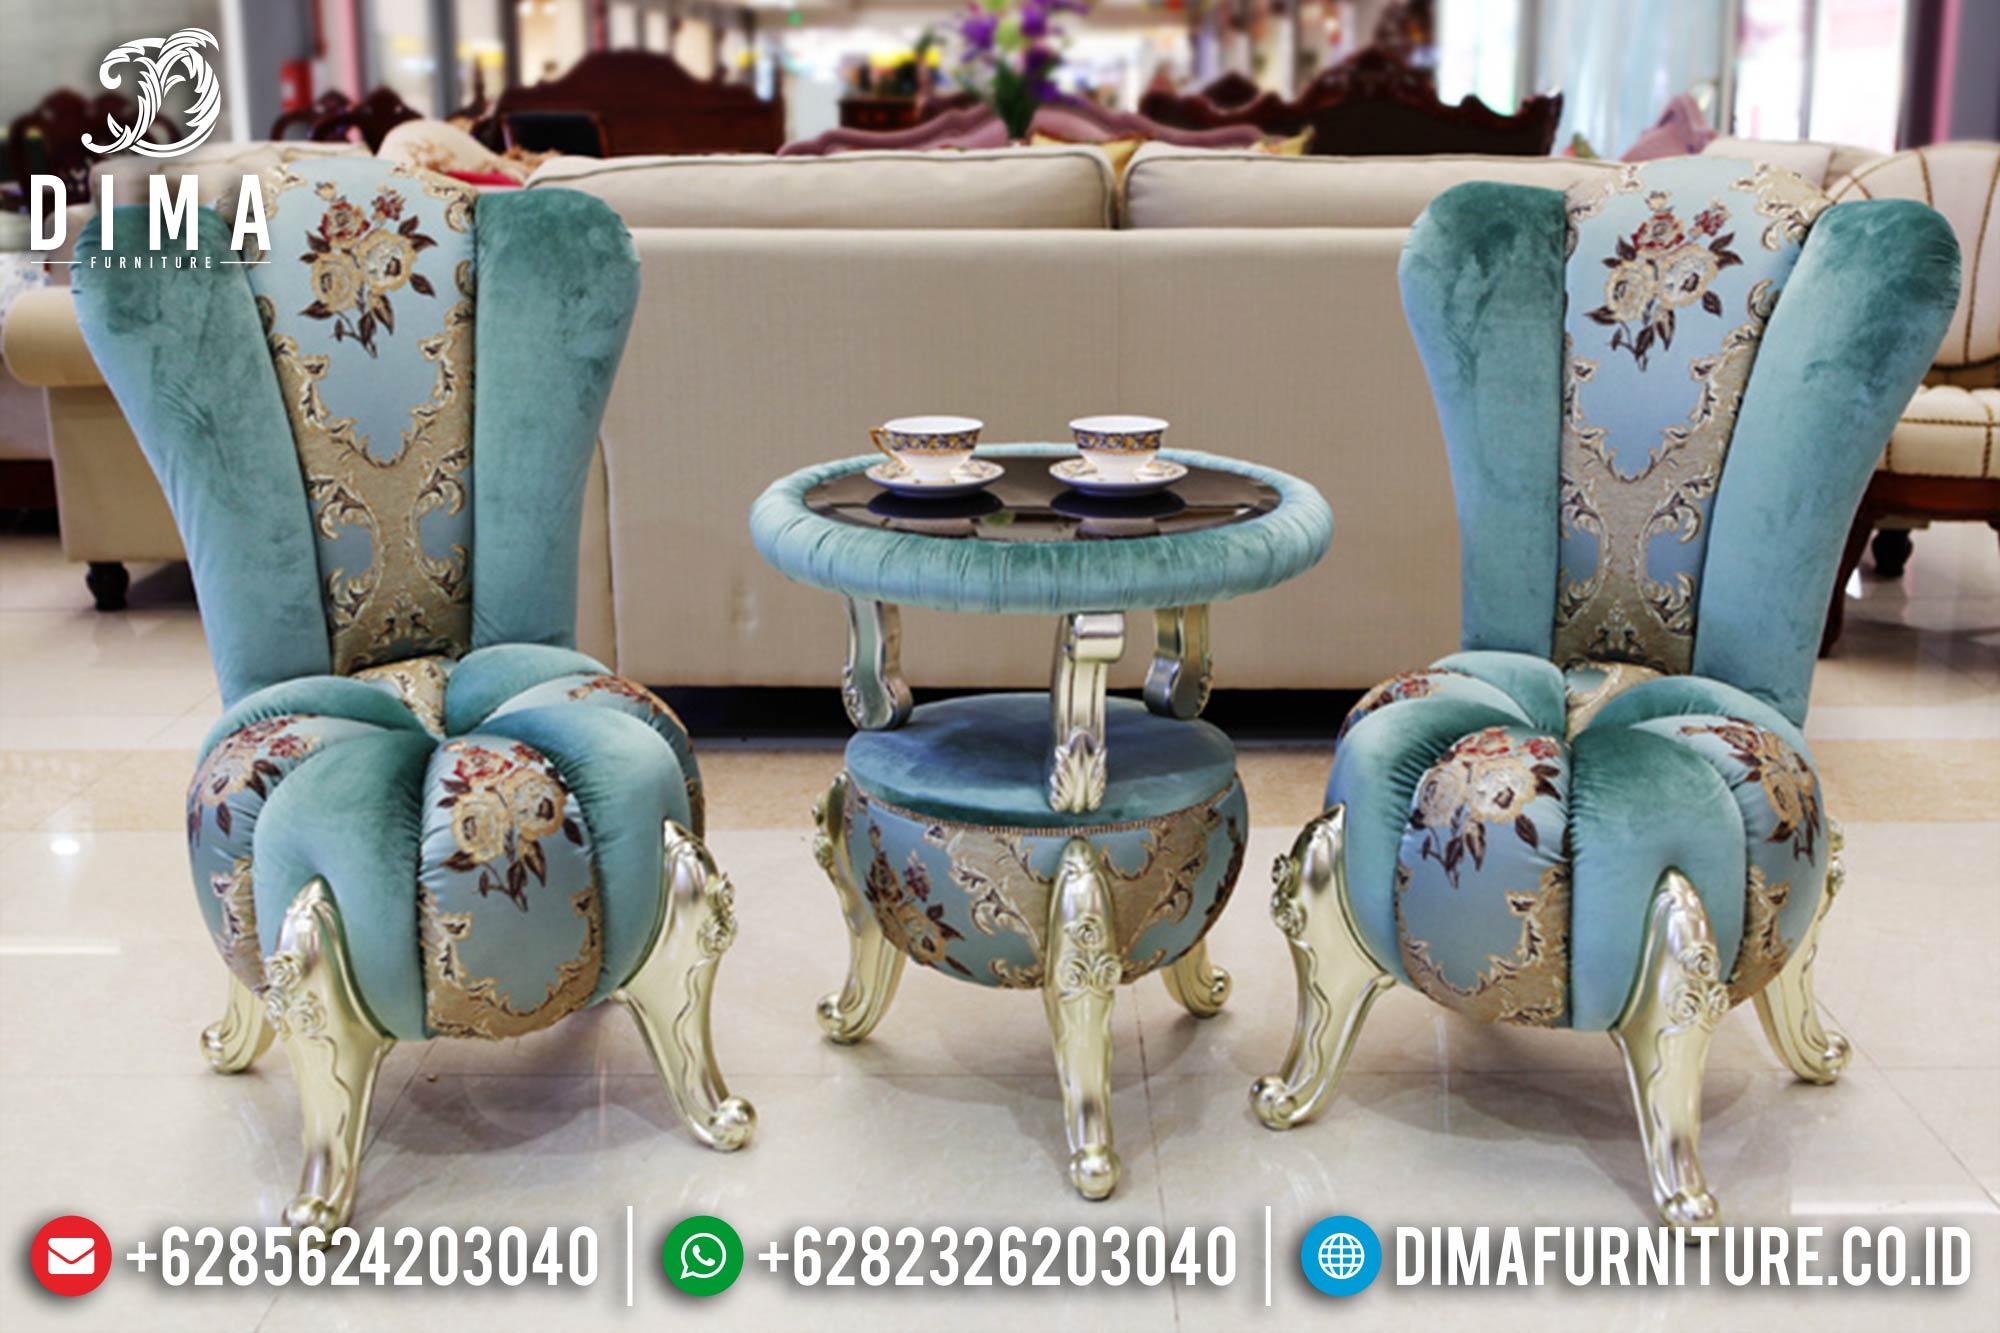 Kursi Sofa Teras Minimalis Mewah Jepara Terbaru Seri Labuh DF-0387